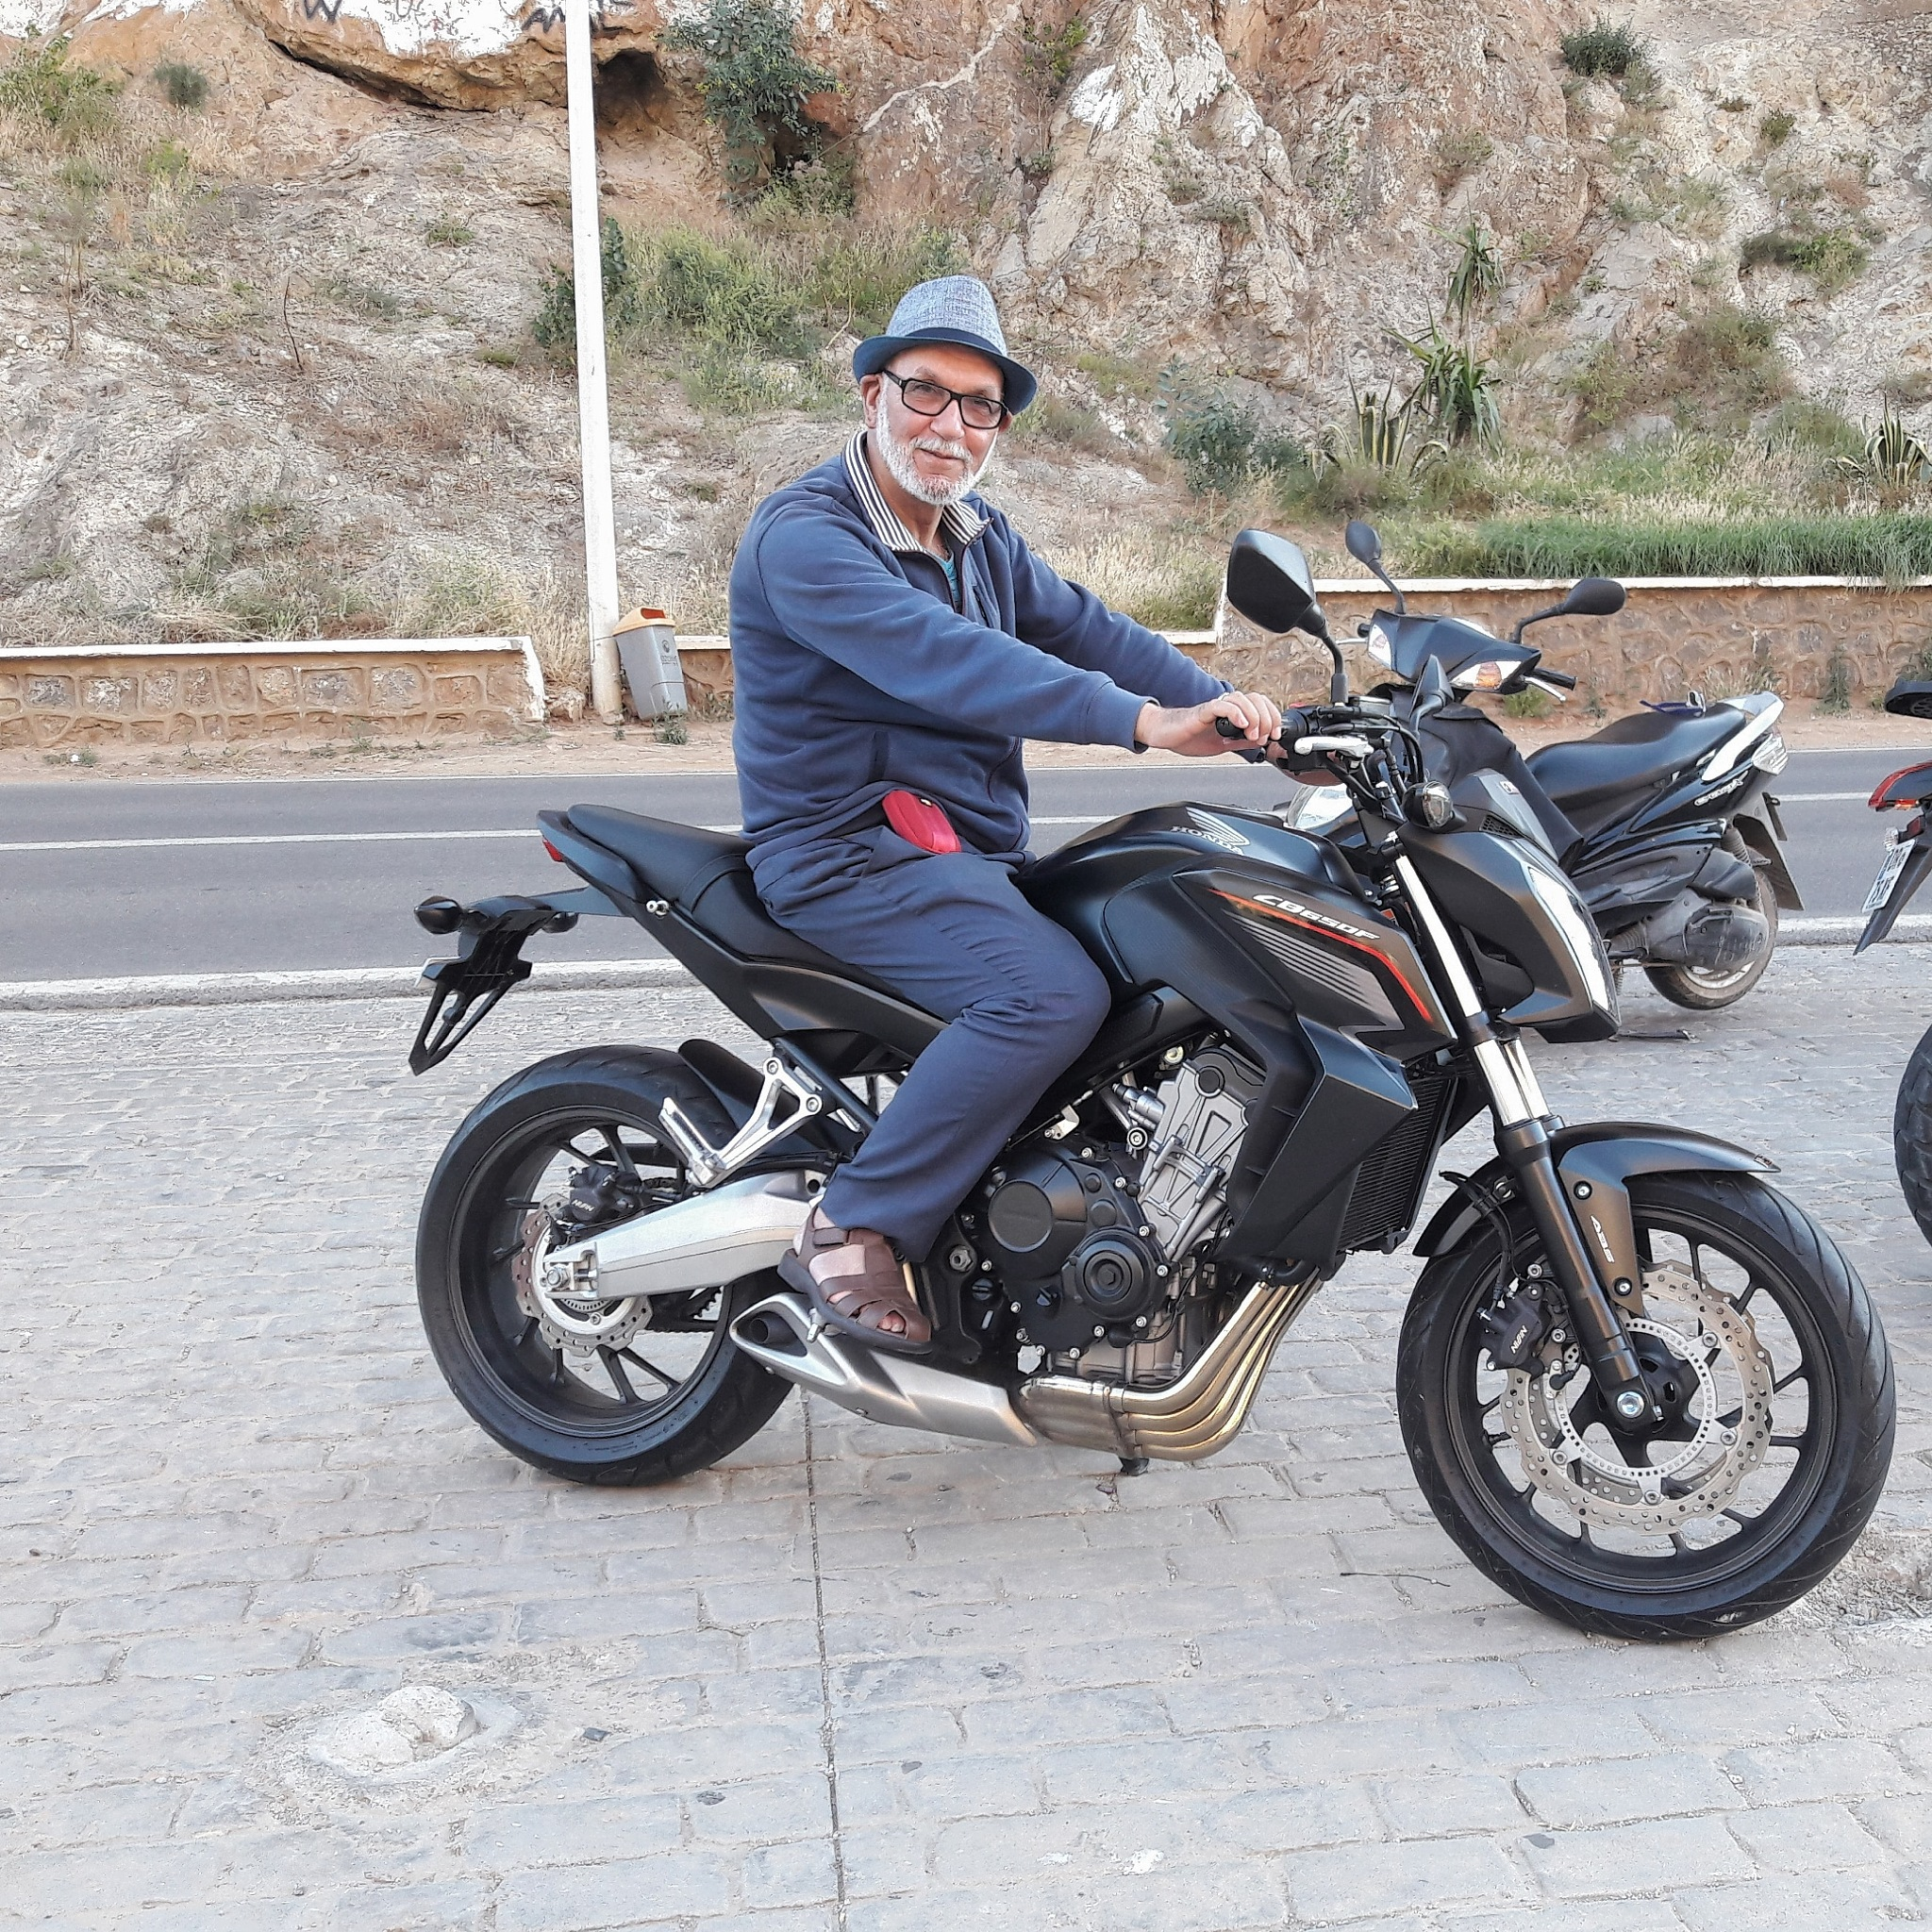 Essai sur une moto  by Abdelhamid Hadouch